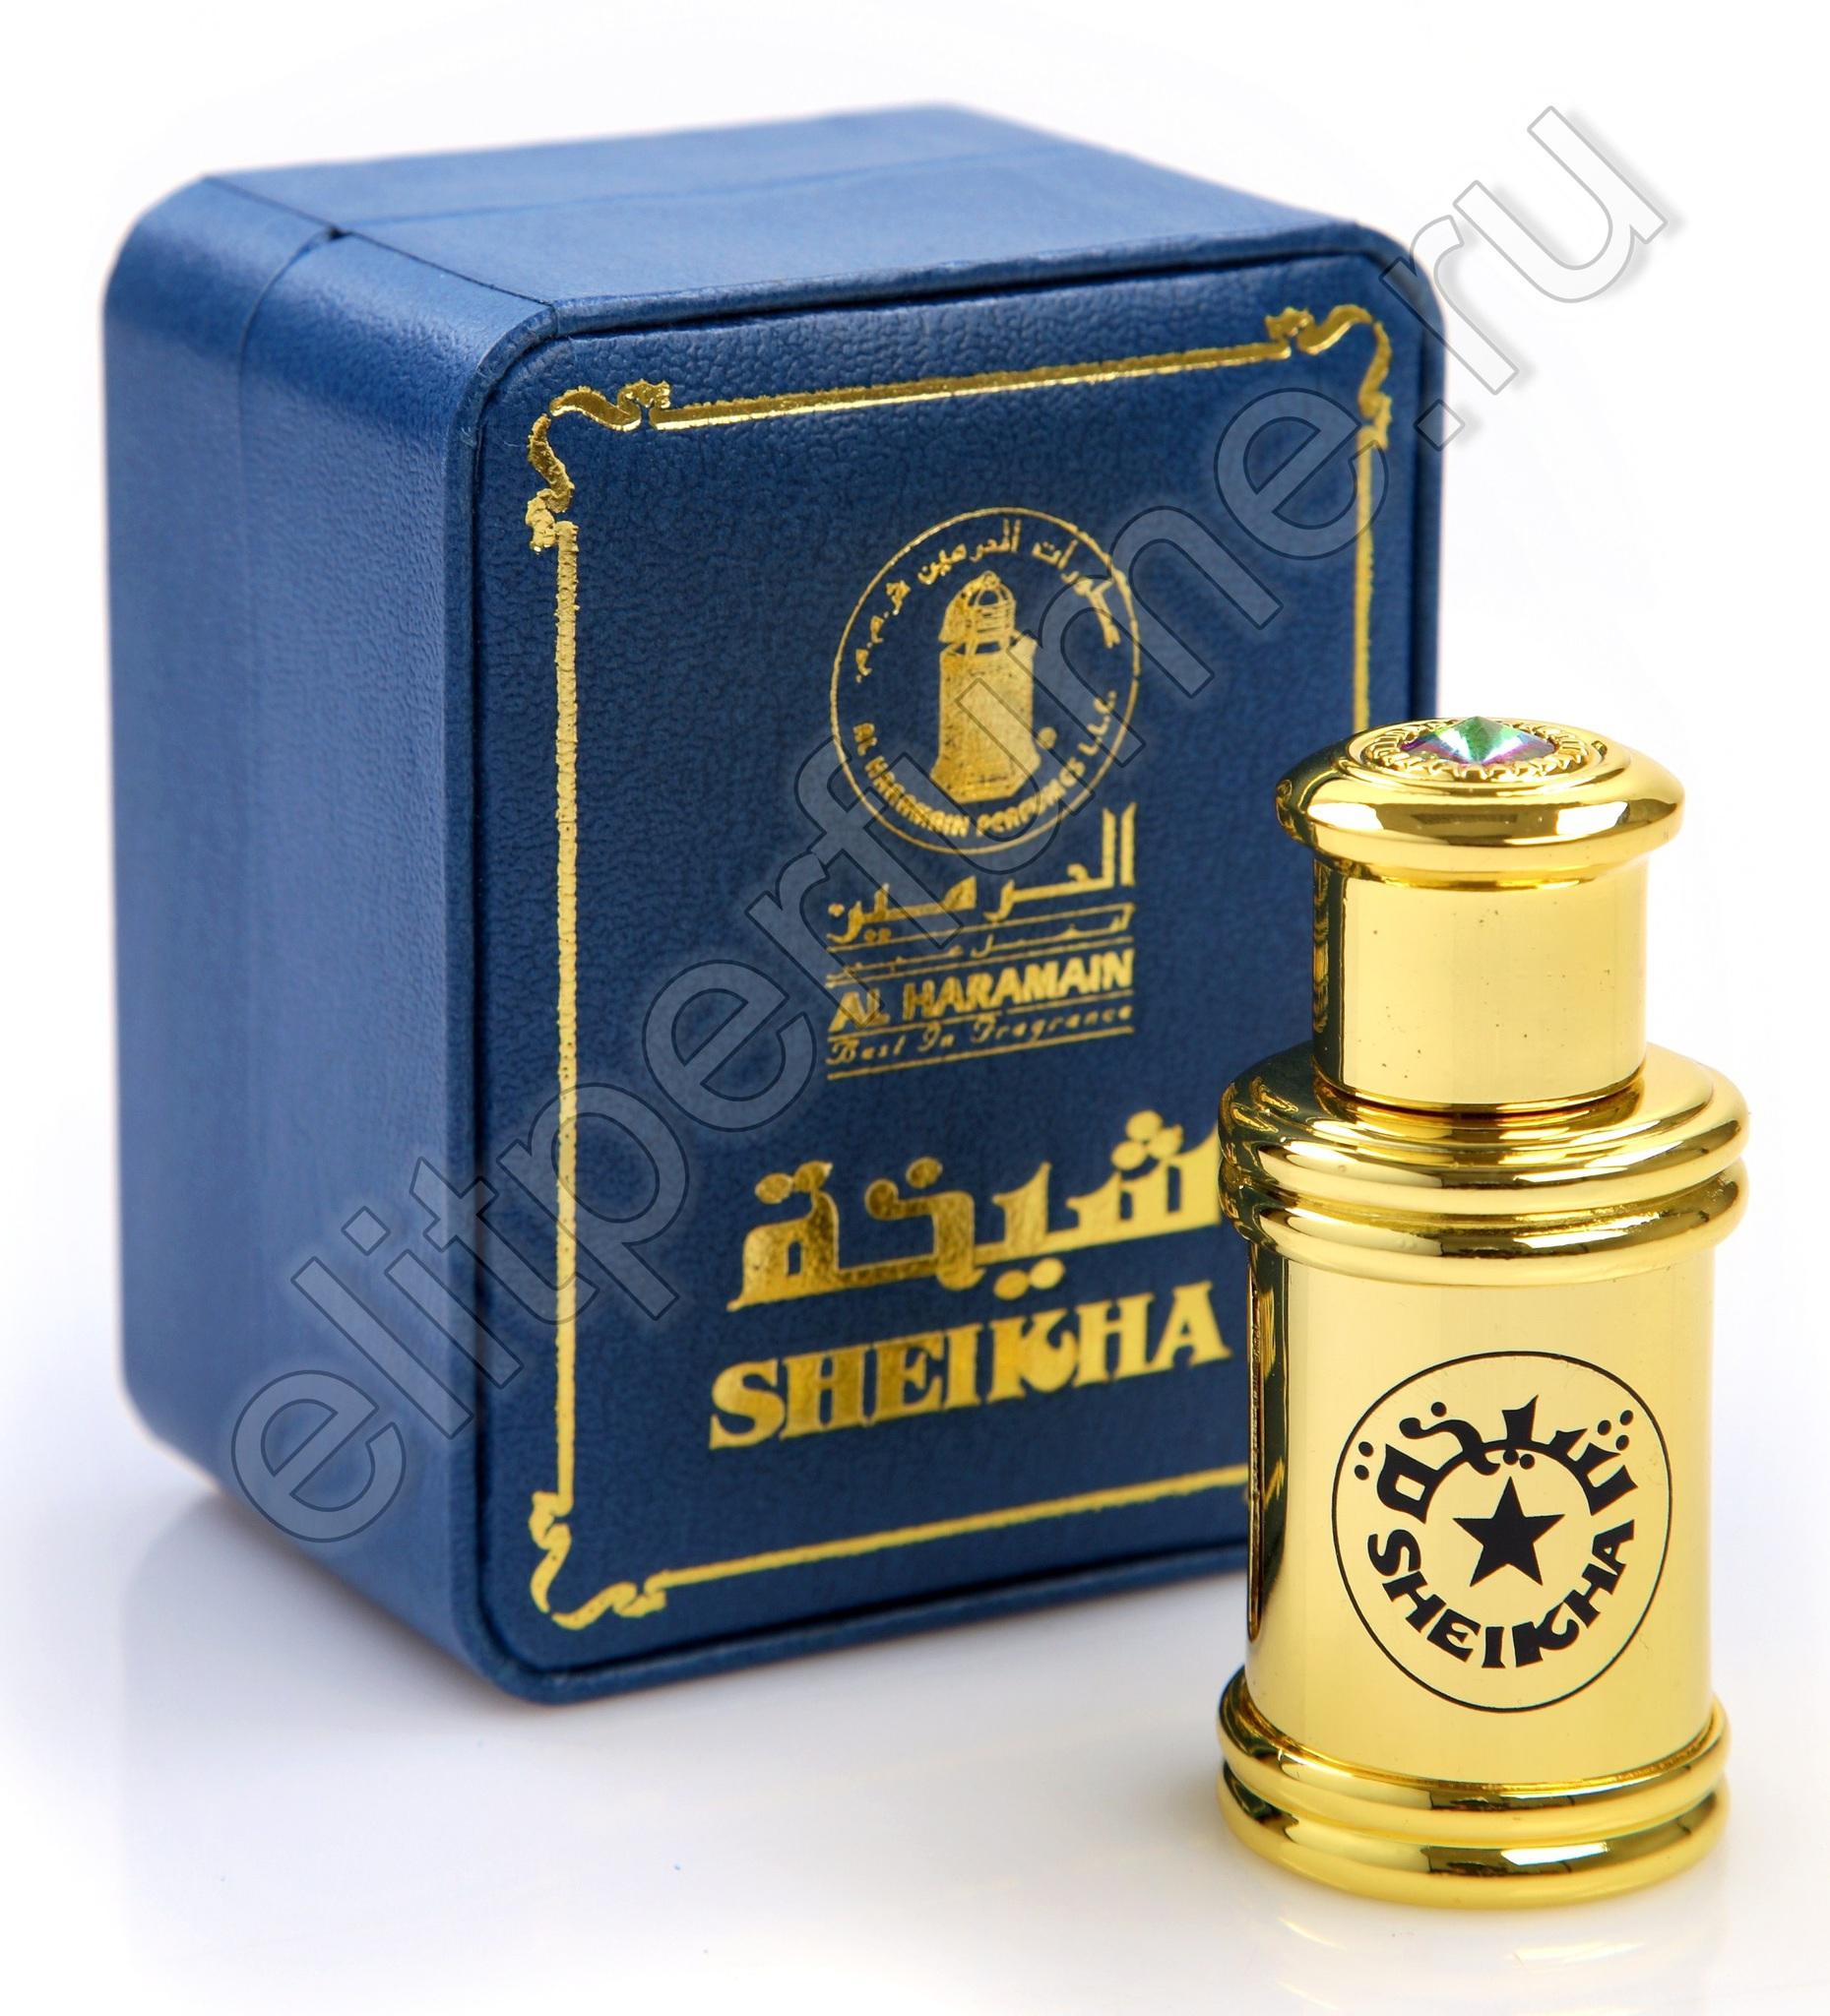 Пробники для духов Шейха Sheikha 1 мл арабские масляные духи от Аль Харамайн Al Haramin Perfumes